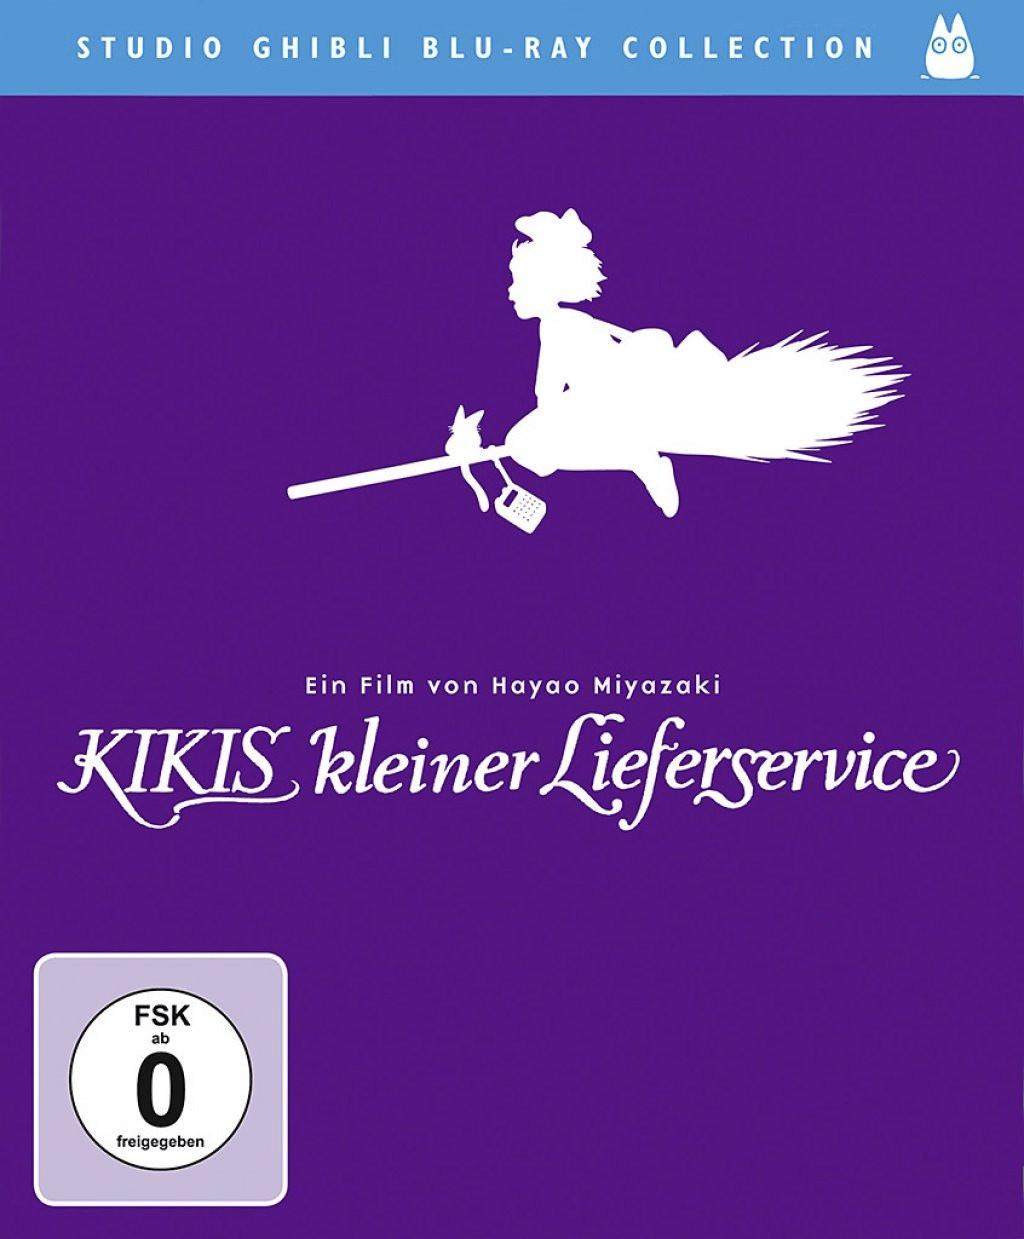 Kikis kleiner Lieferservice (Studio Ghibli Blu-ray Collection)